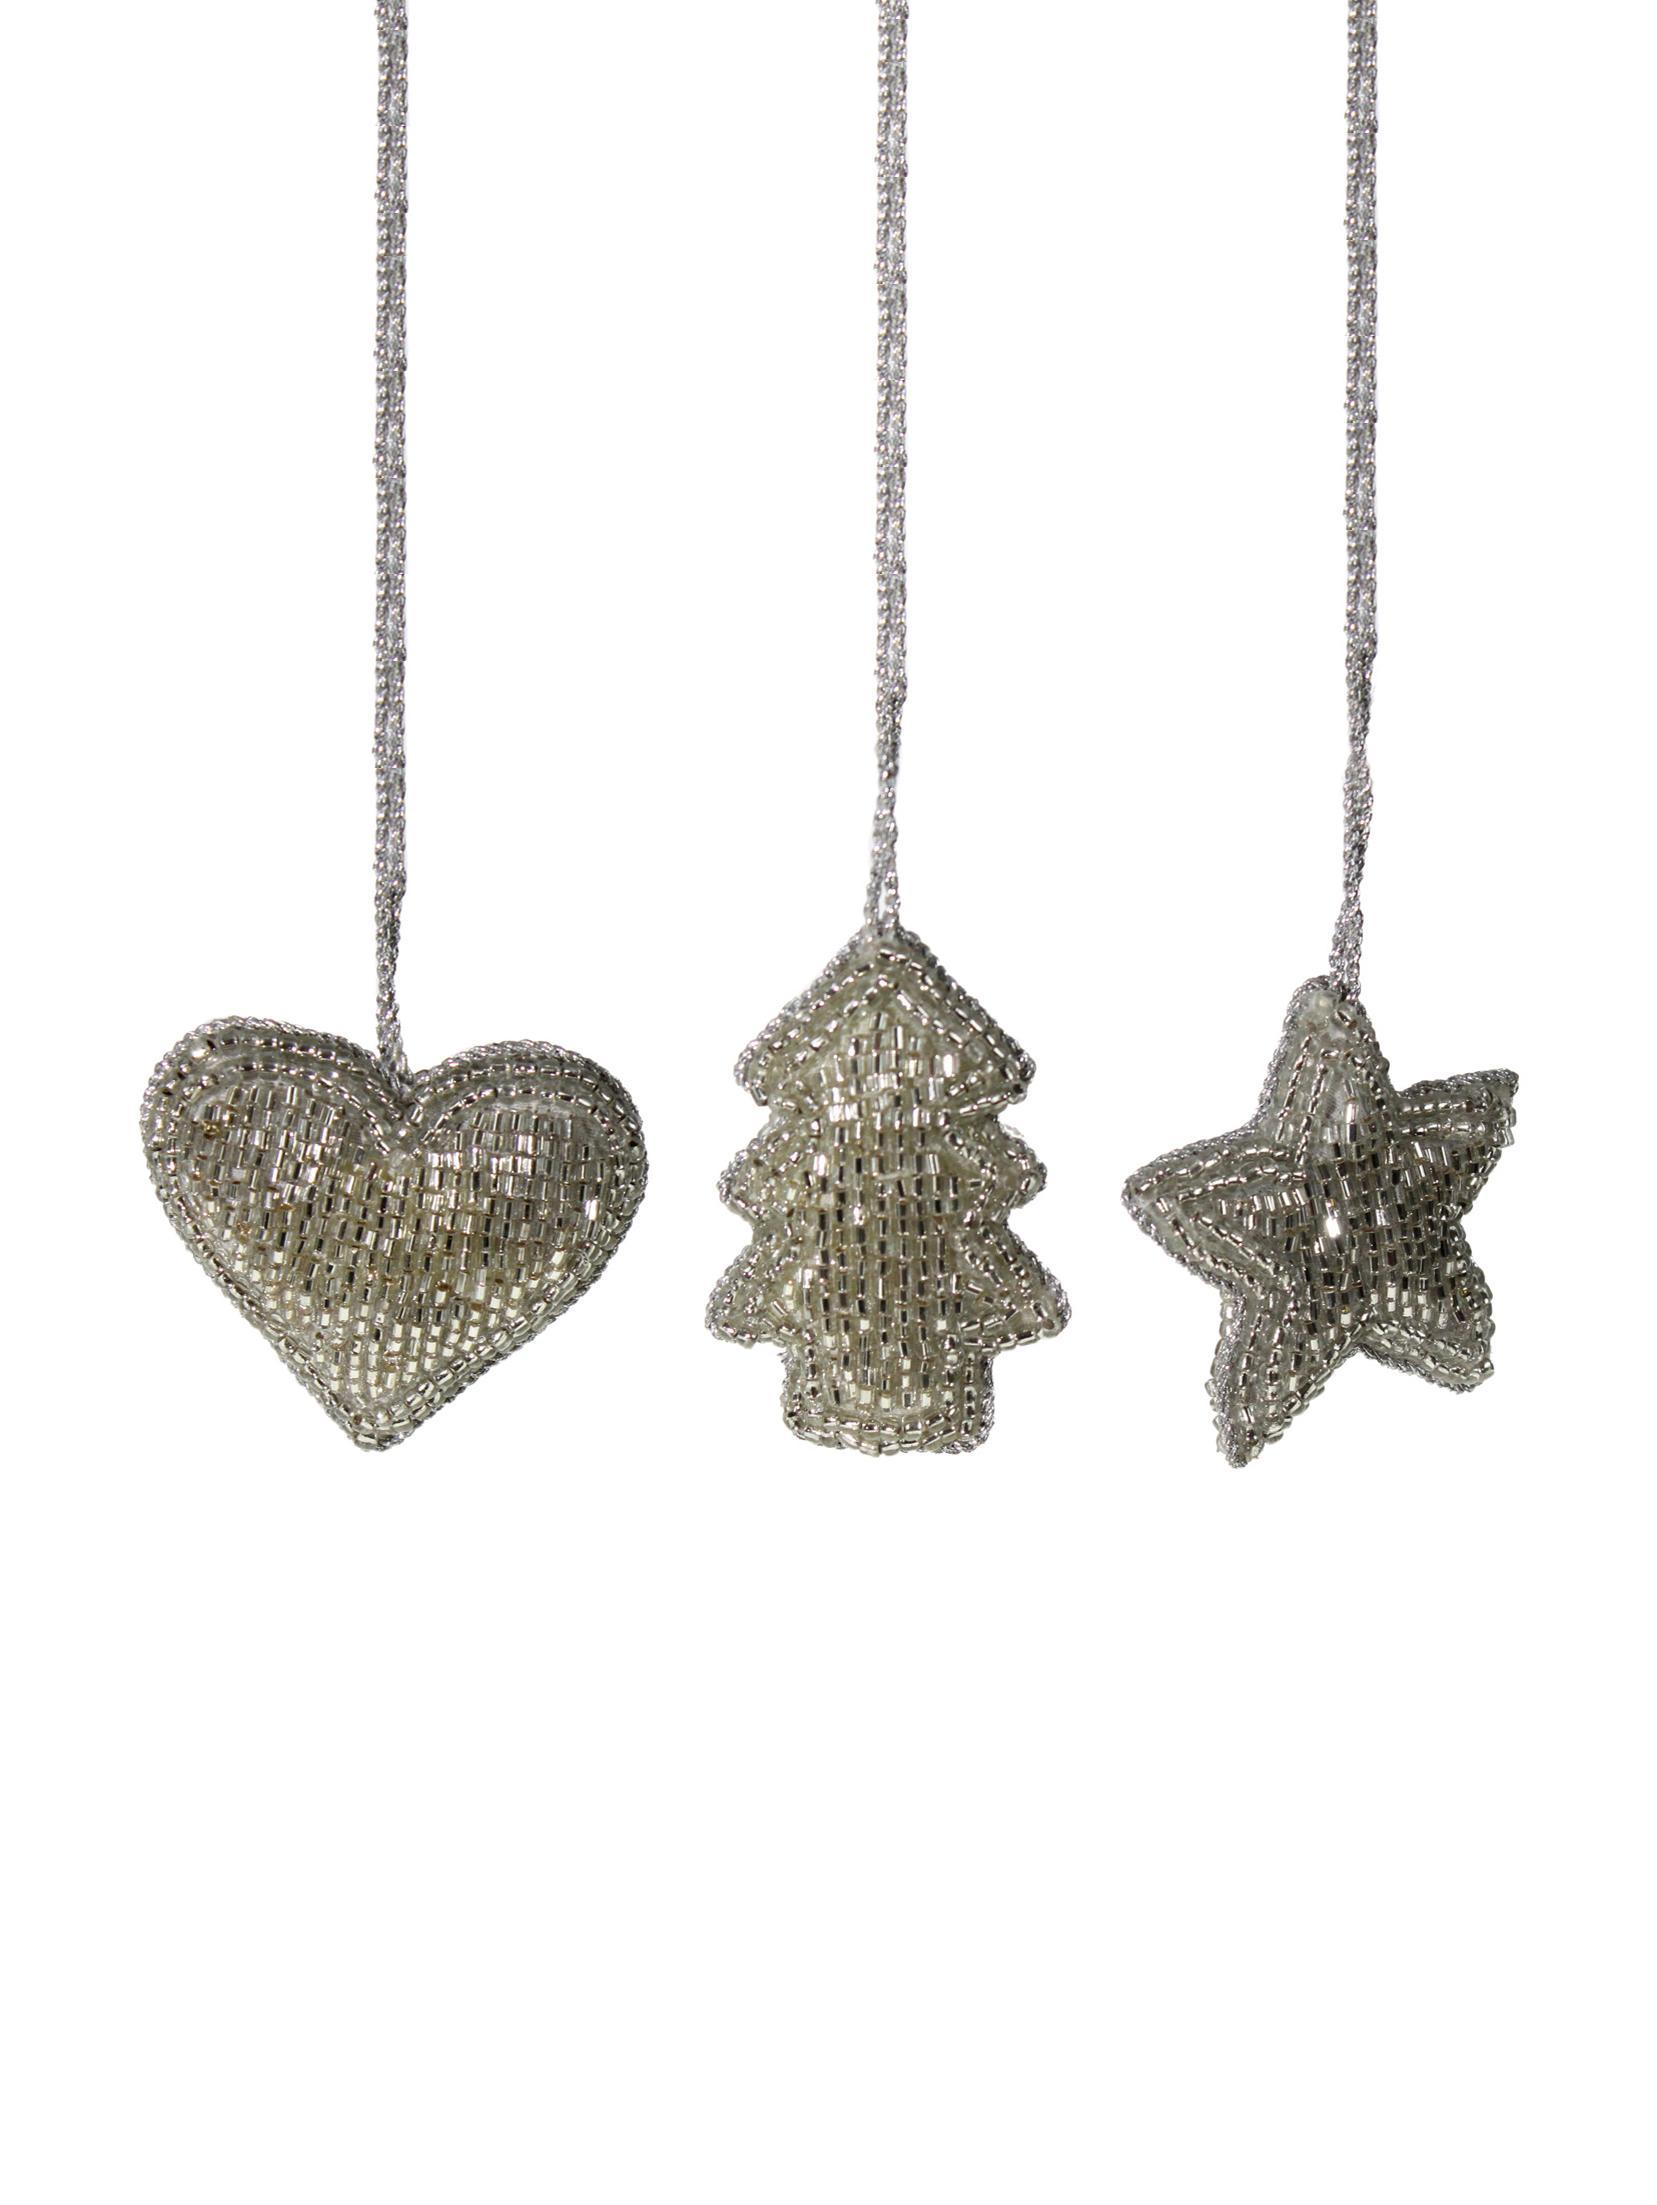 Set de adornos navideños Pearl, 3pzas., Plástico, Plateado, Ancho 6 x Alto 6 cm